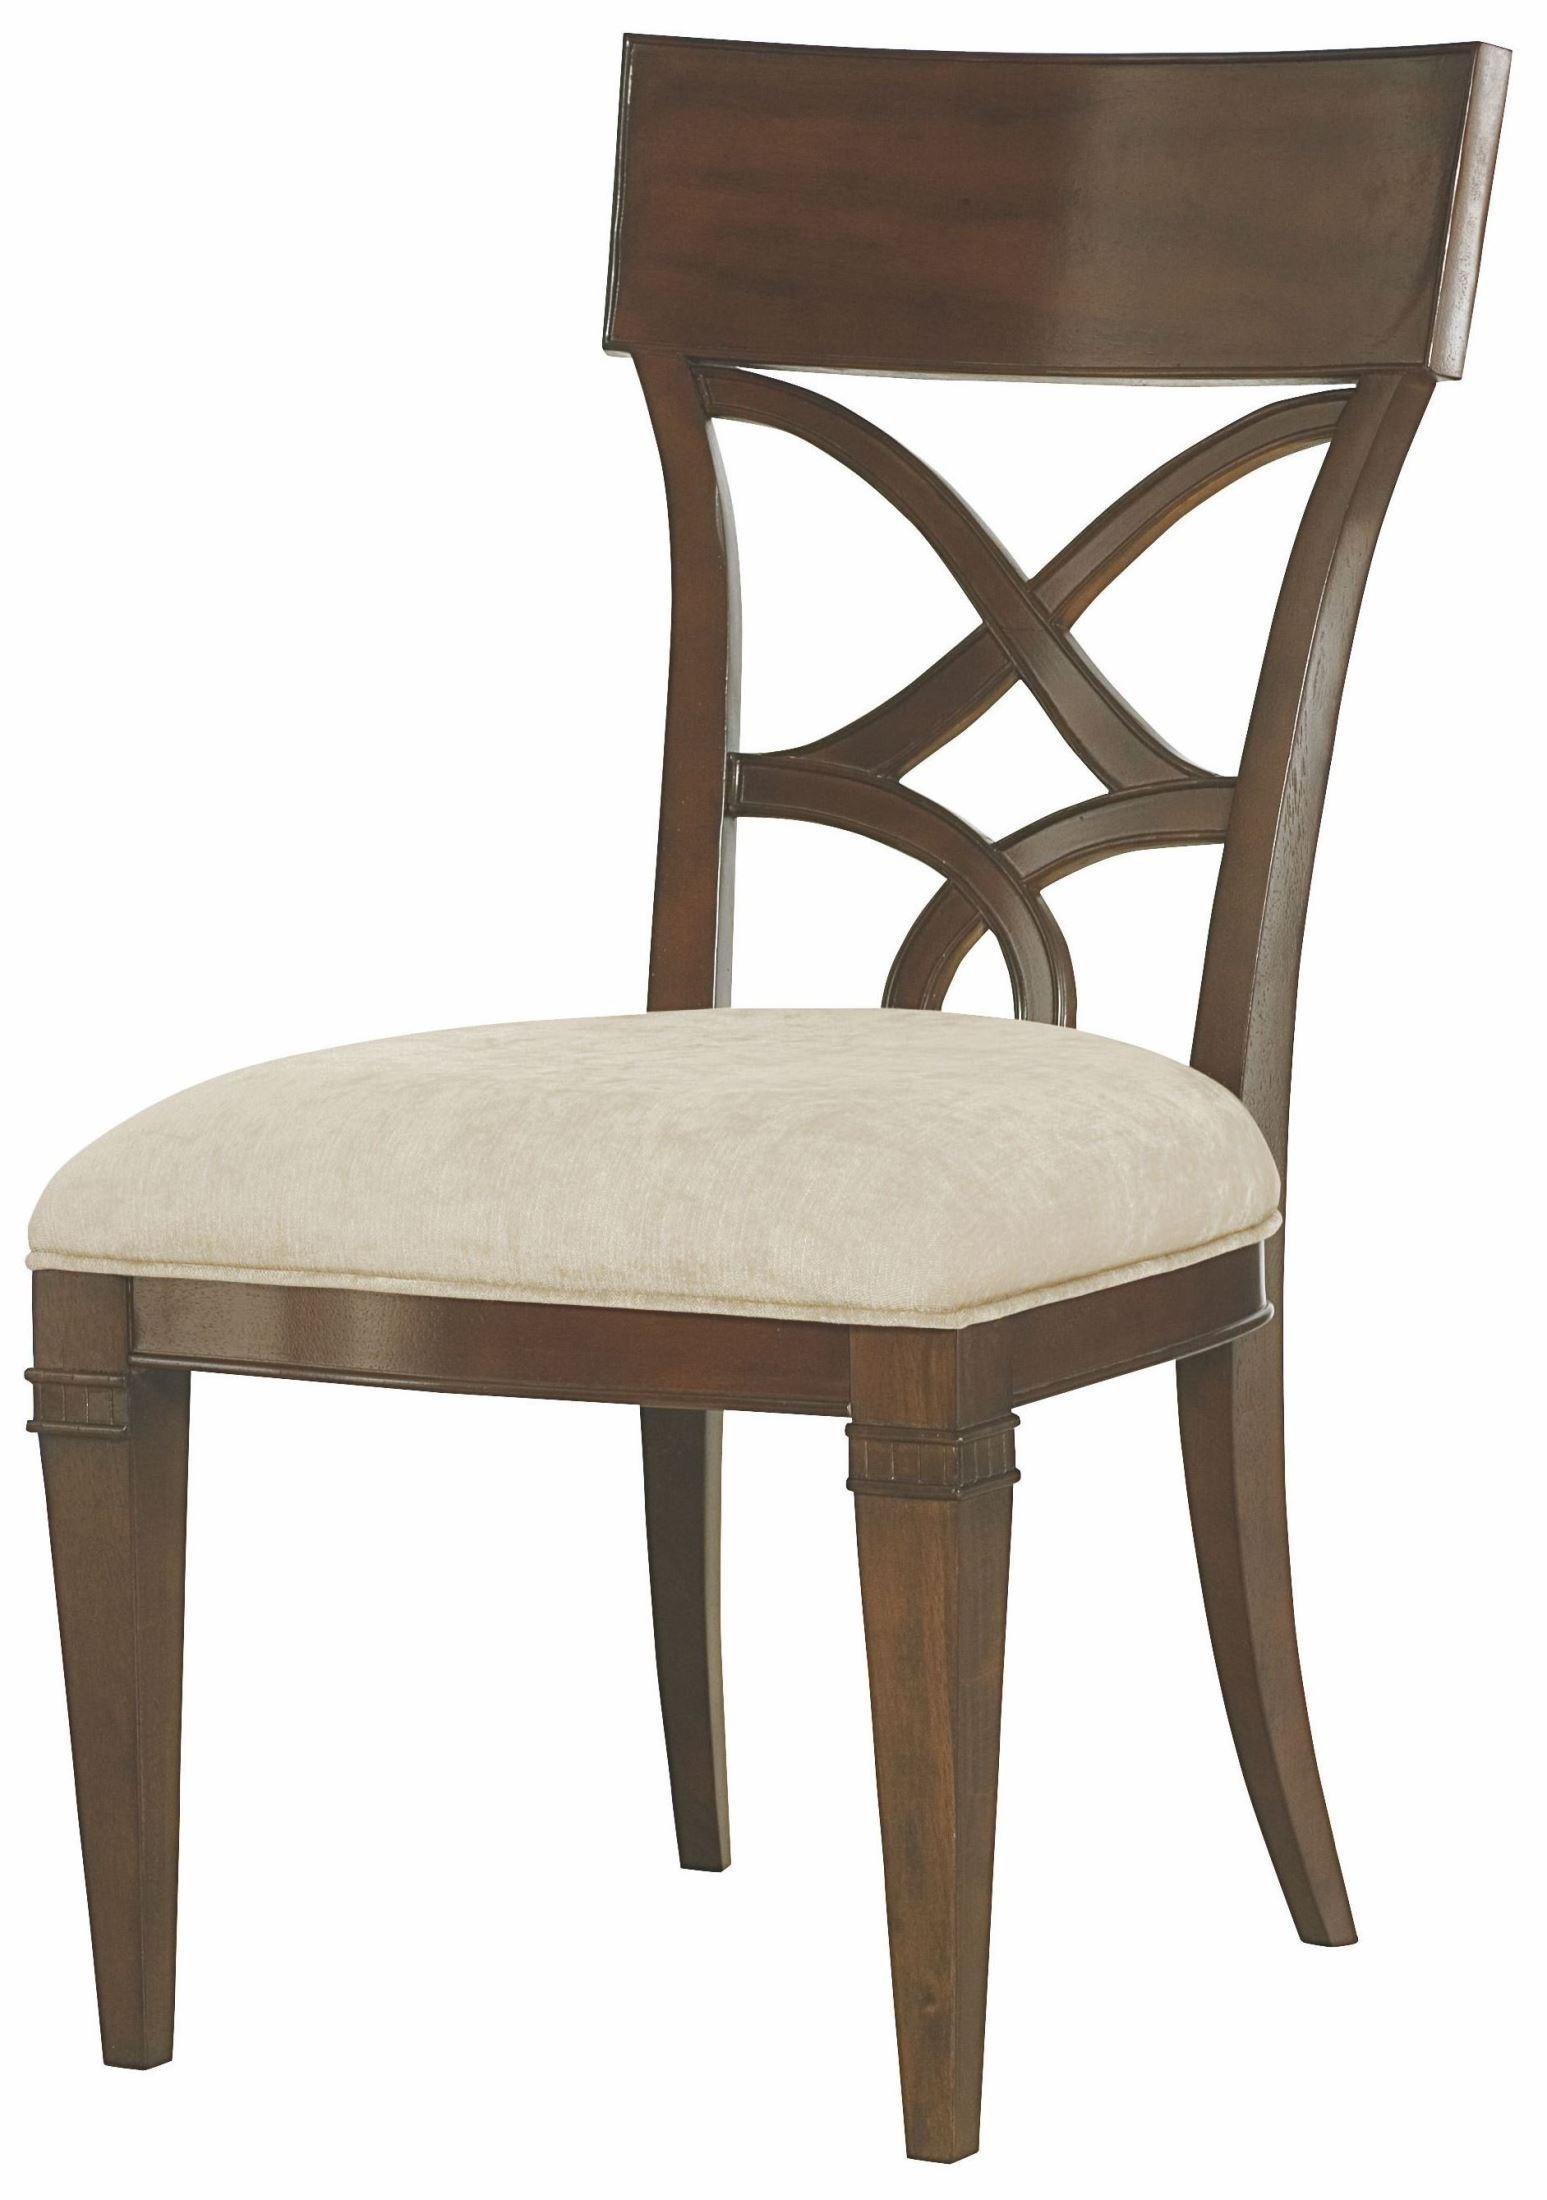 Bob Mackie Home Mink Splat Back Side Chair 308 636 American Drew